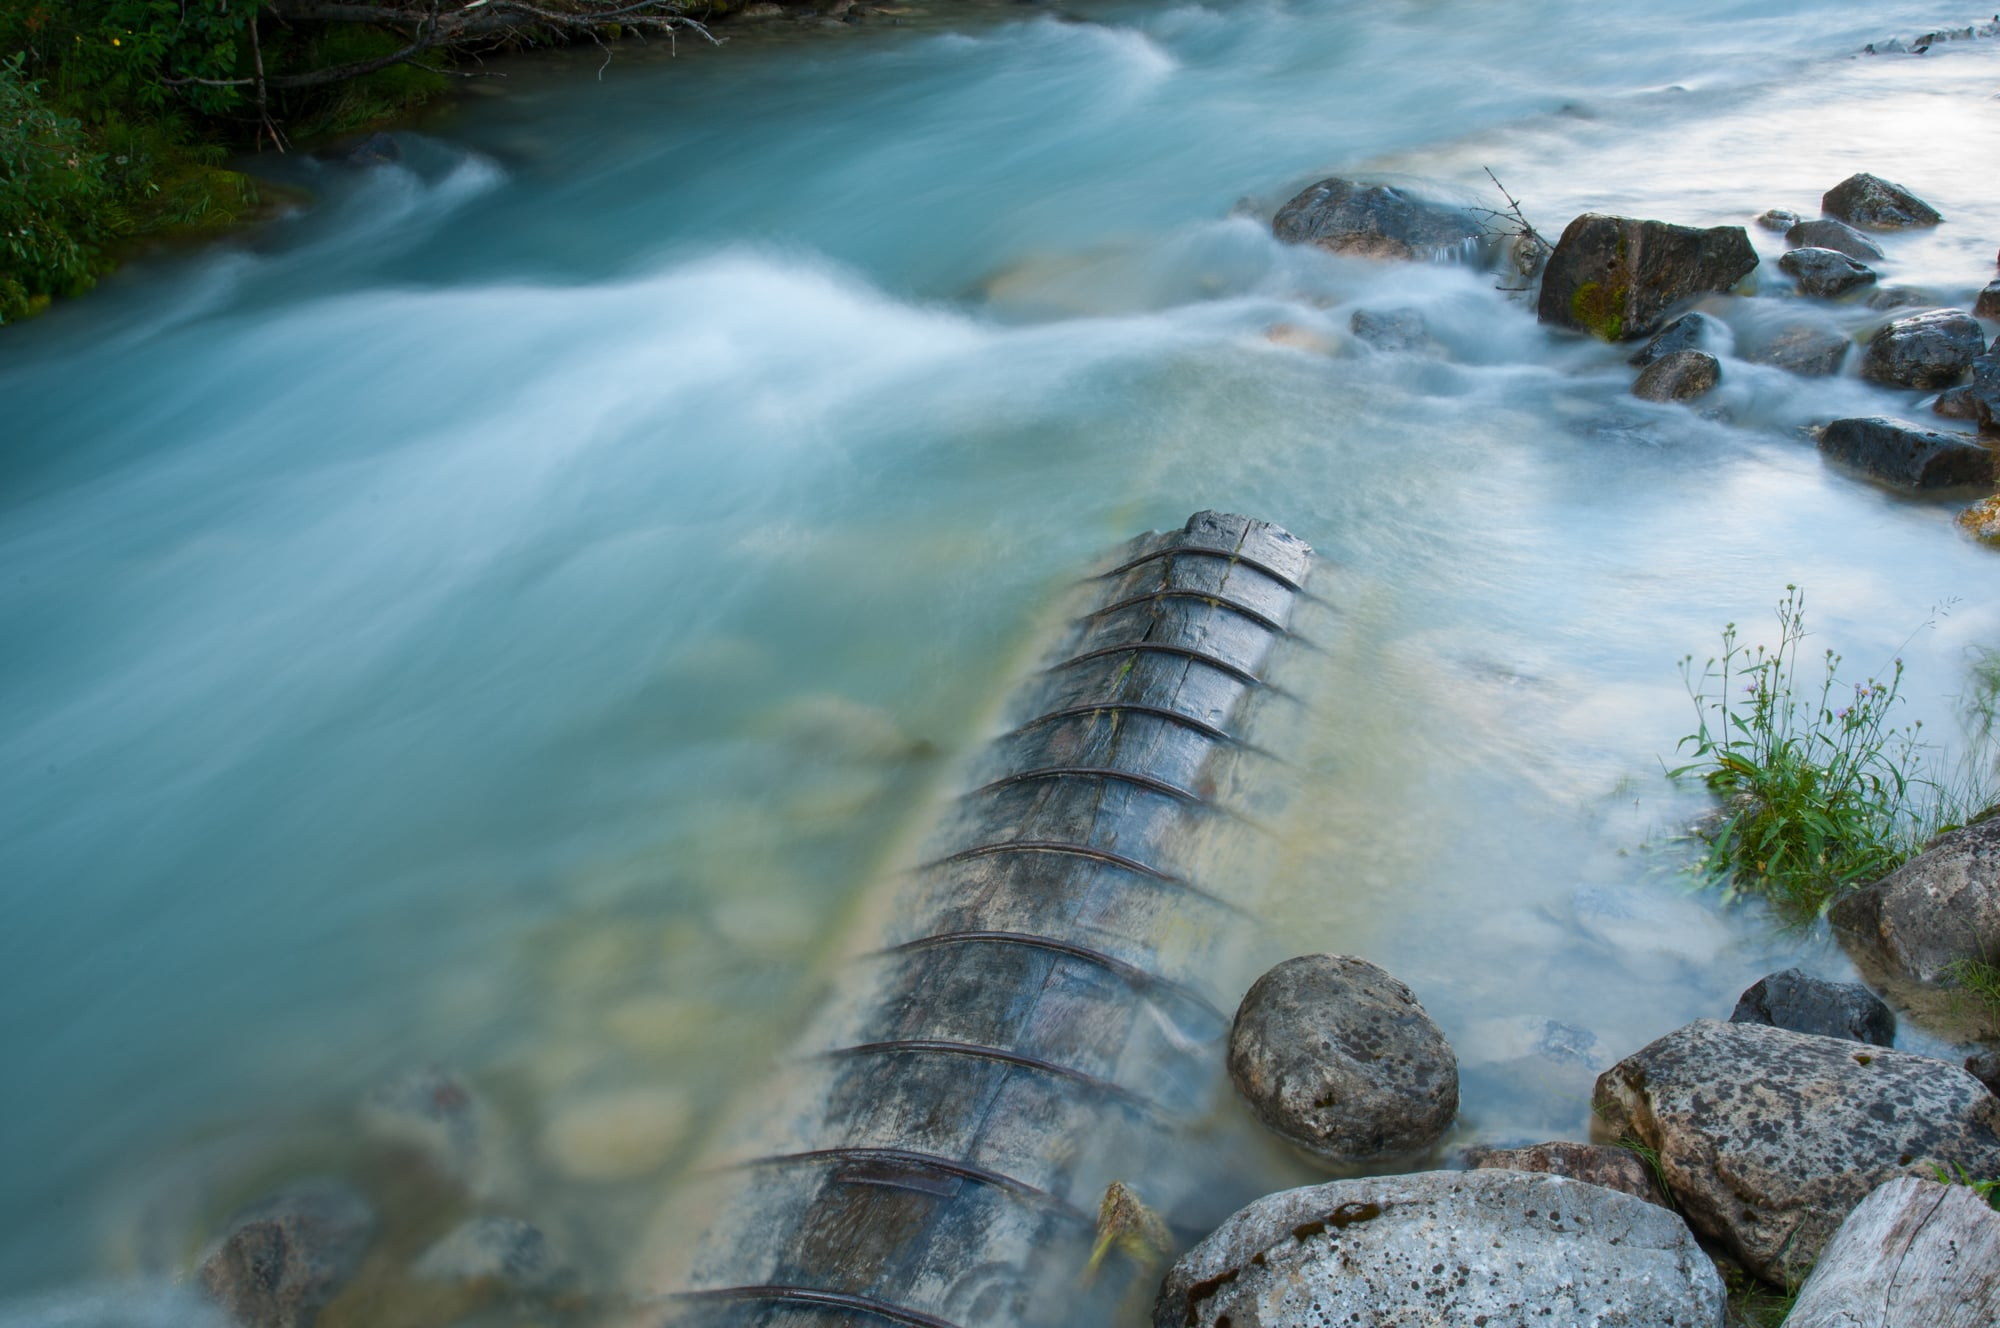 Aquaduct, Louise Creek, Lake Louise, Banff National Park, July 2015